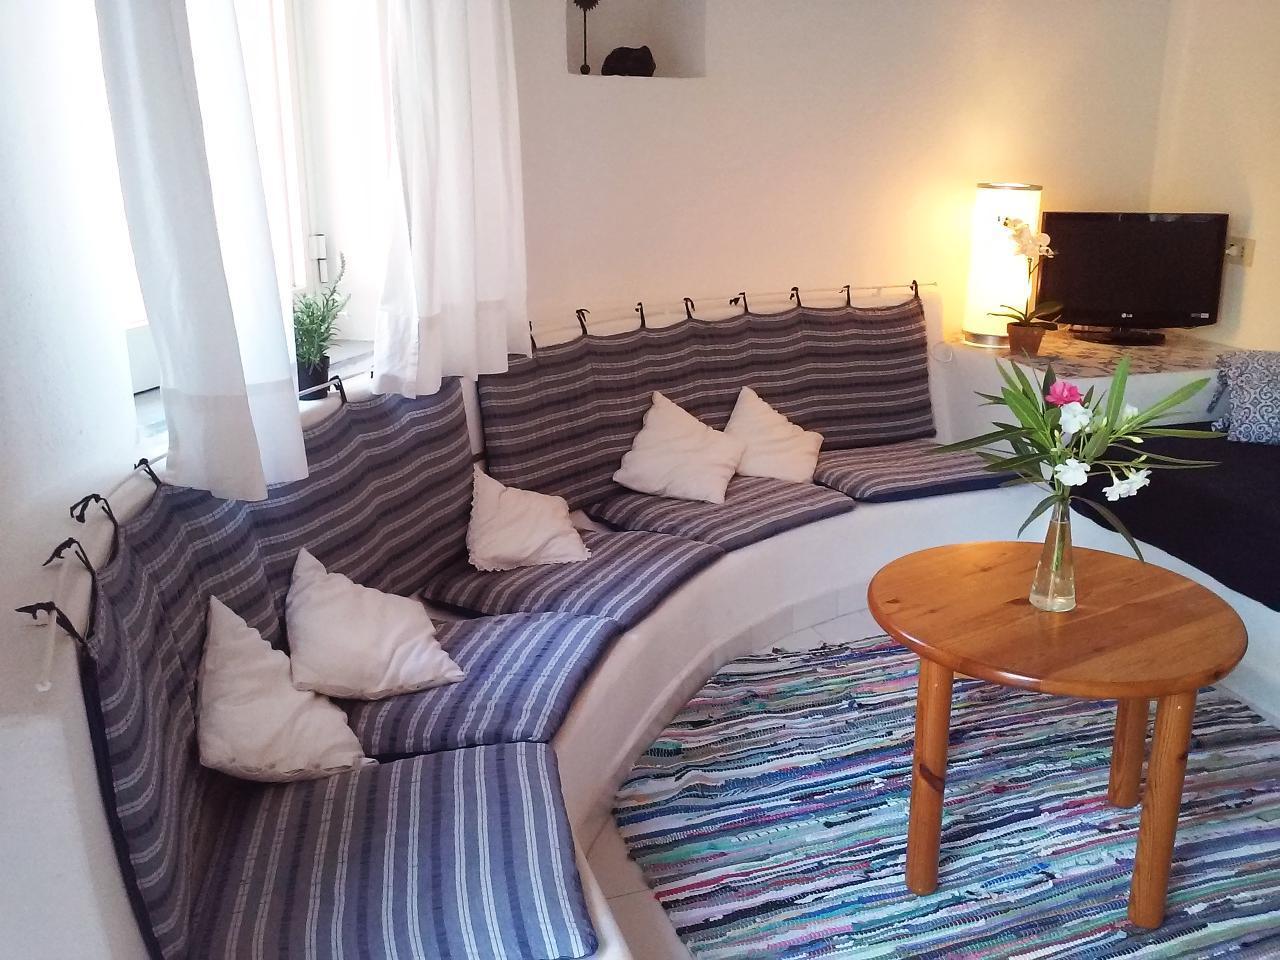 Maison de vacances Ferienhaushälfte Solandra auf sizilianischer Insel mit atemberaubenden Meeres-Rundblick (2038046), Lipari, Lipari, Sicile, Italie, image 10